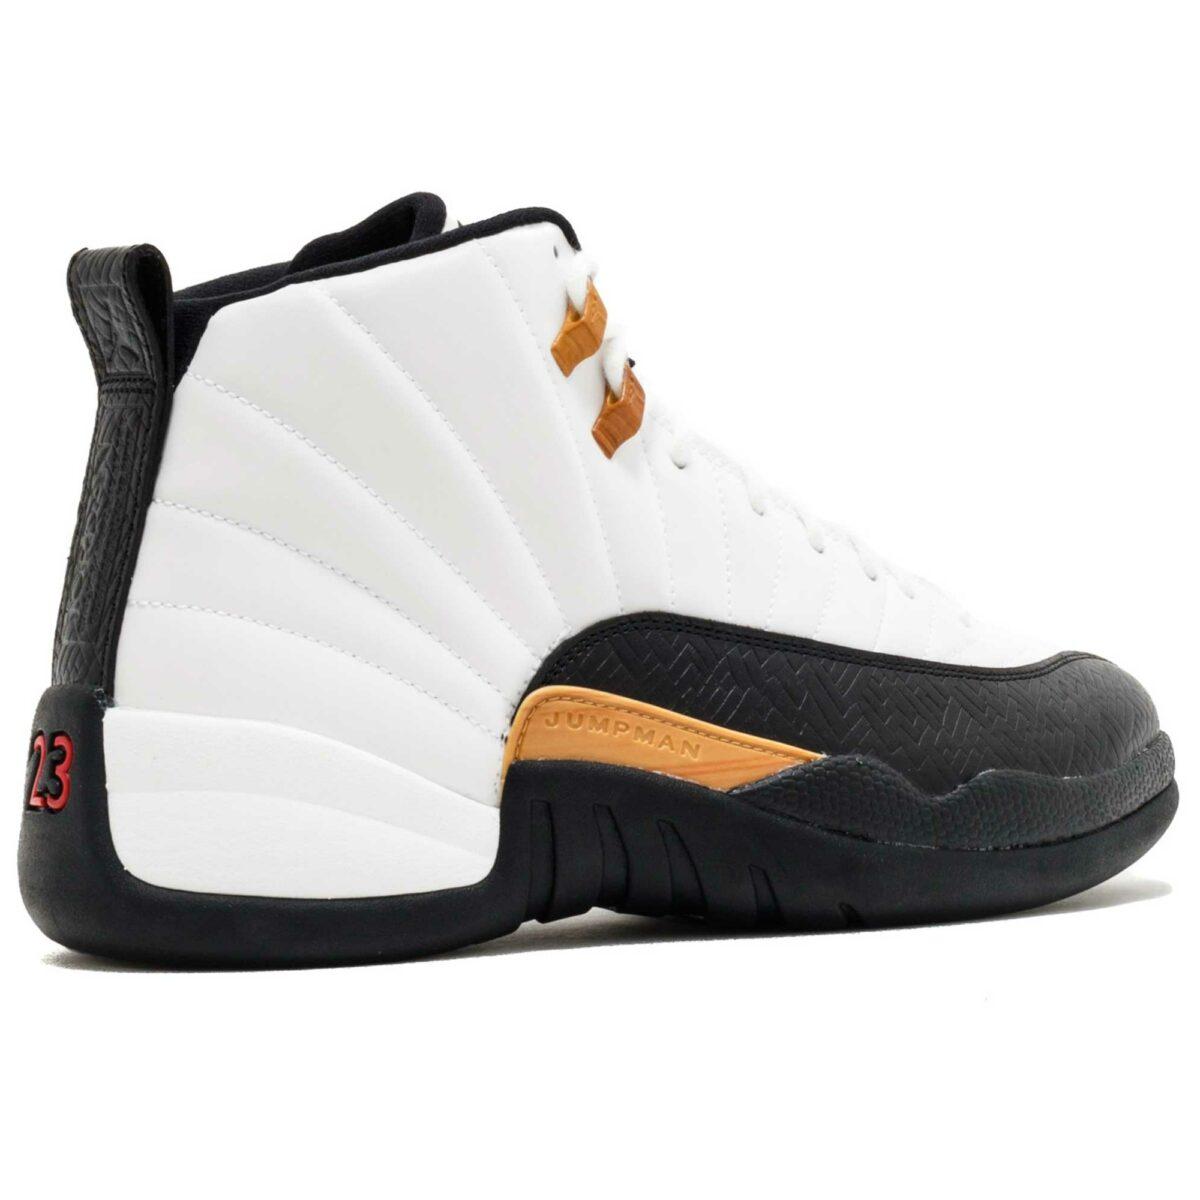 nike air Jordan 12 XII retro cny chinese new year 881427-122 купить